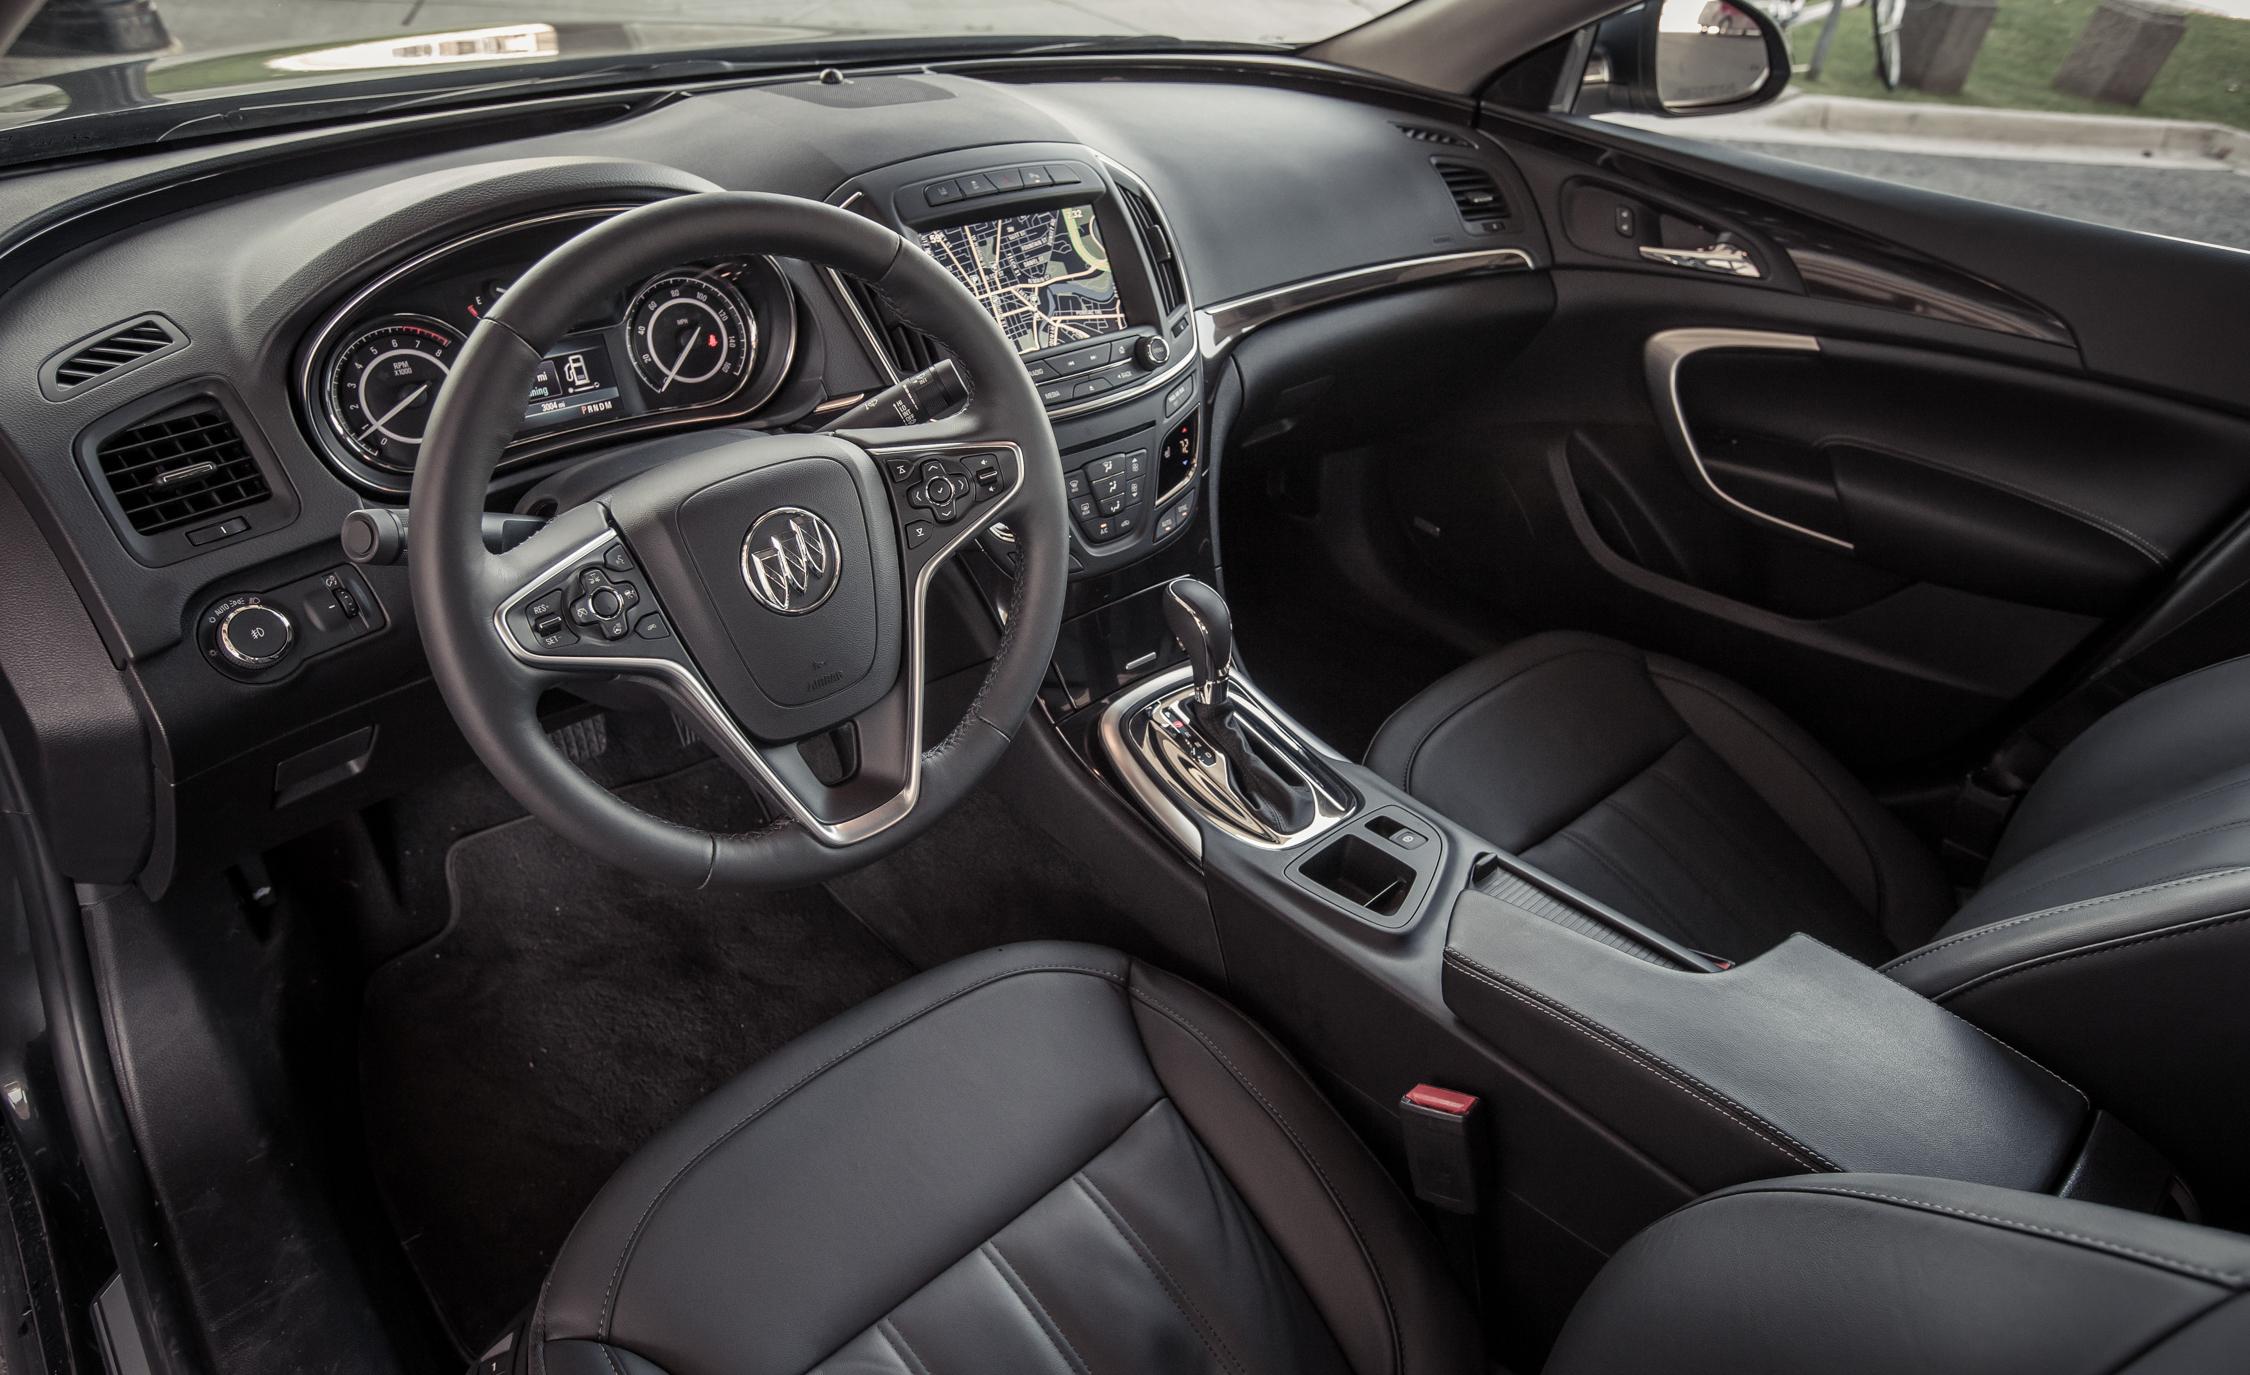 2014 Buick Regal Turbo Interior (View 19 of 30)